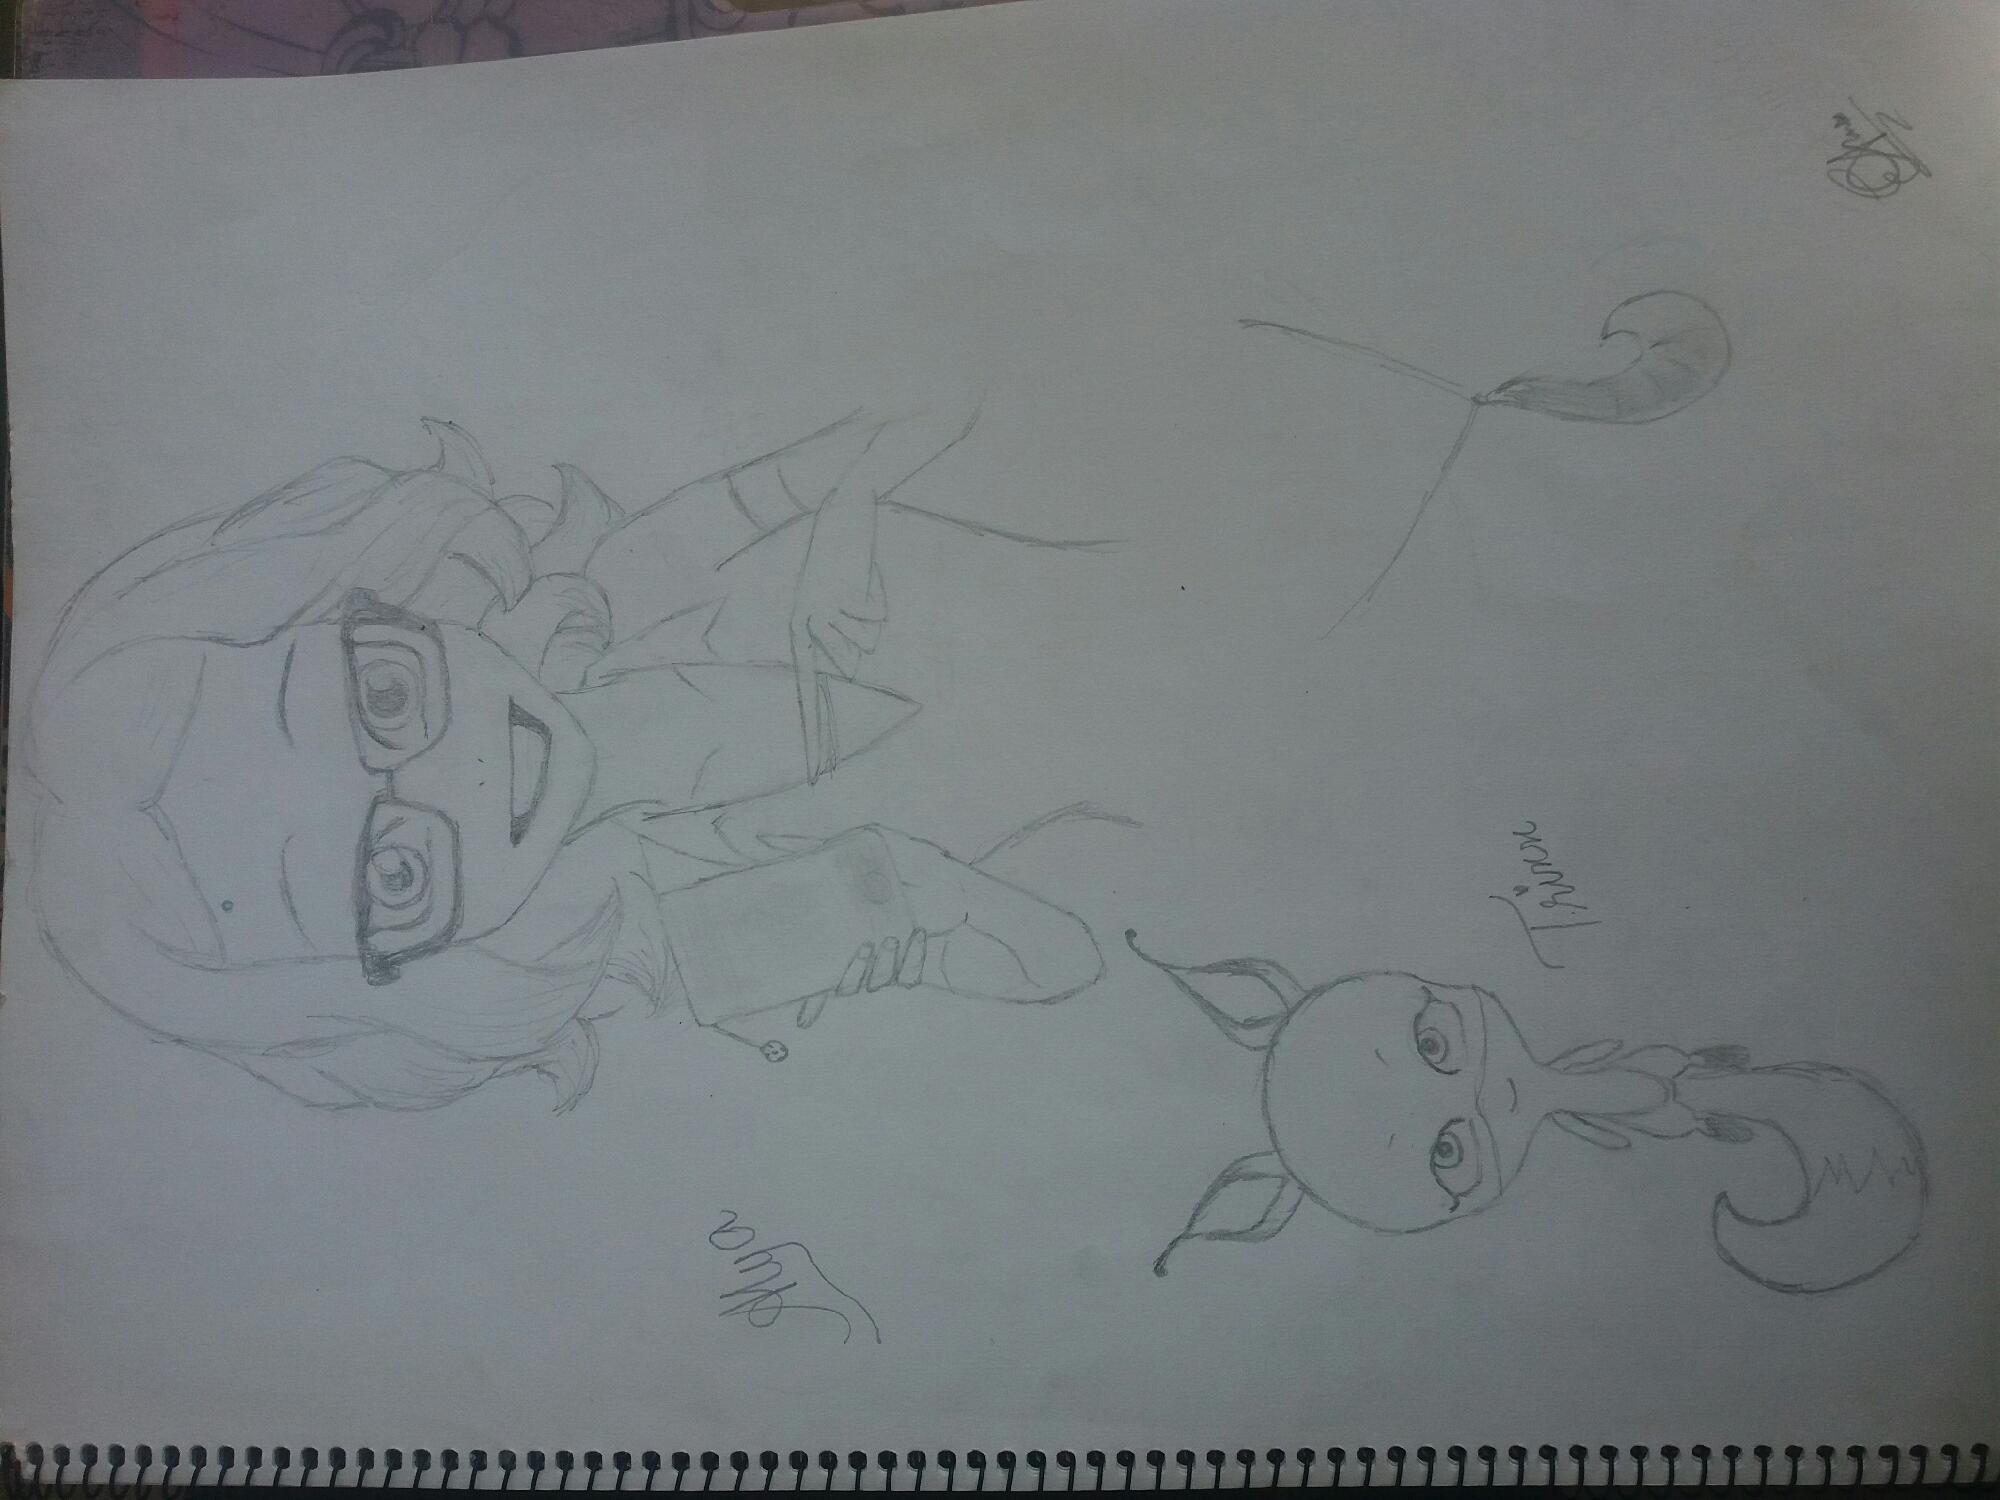 Alya's drawing